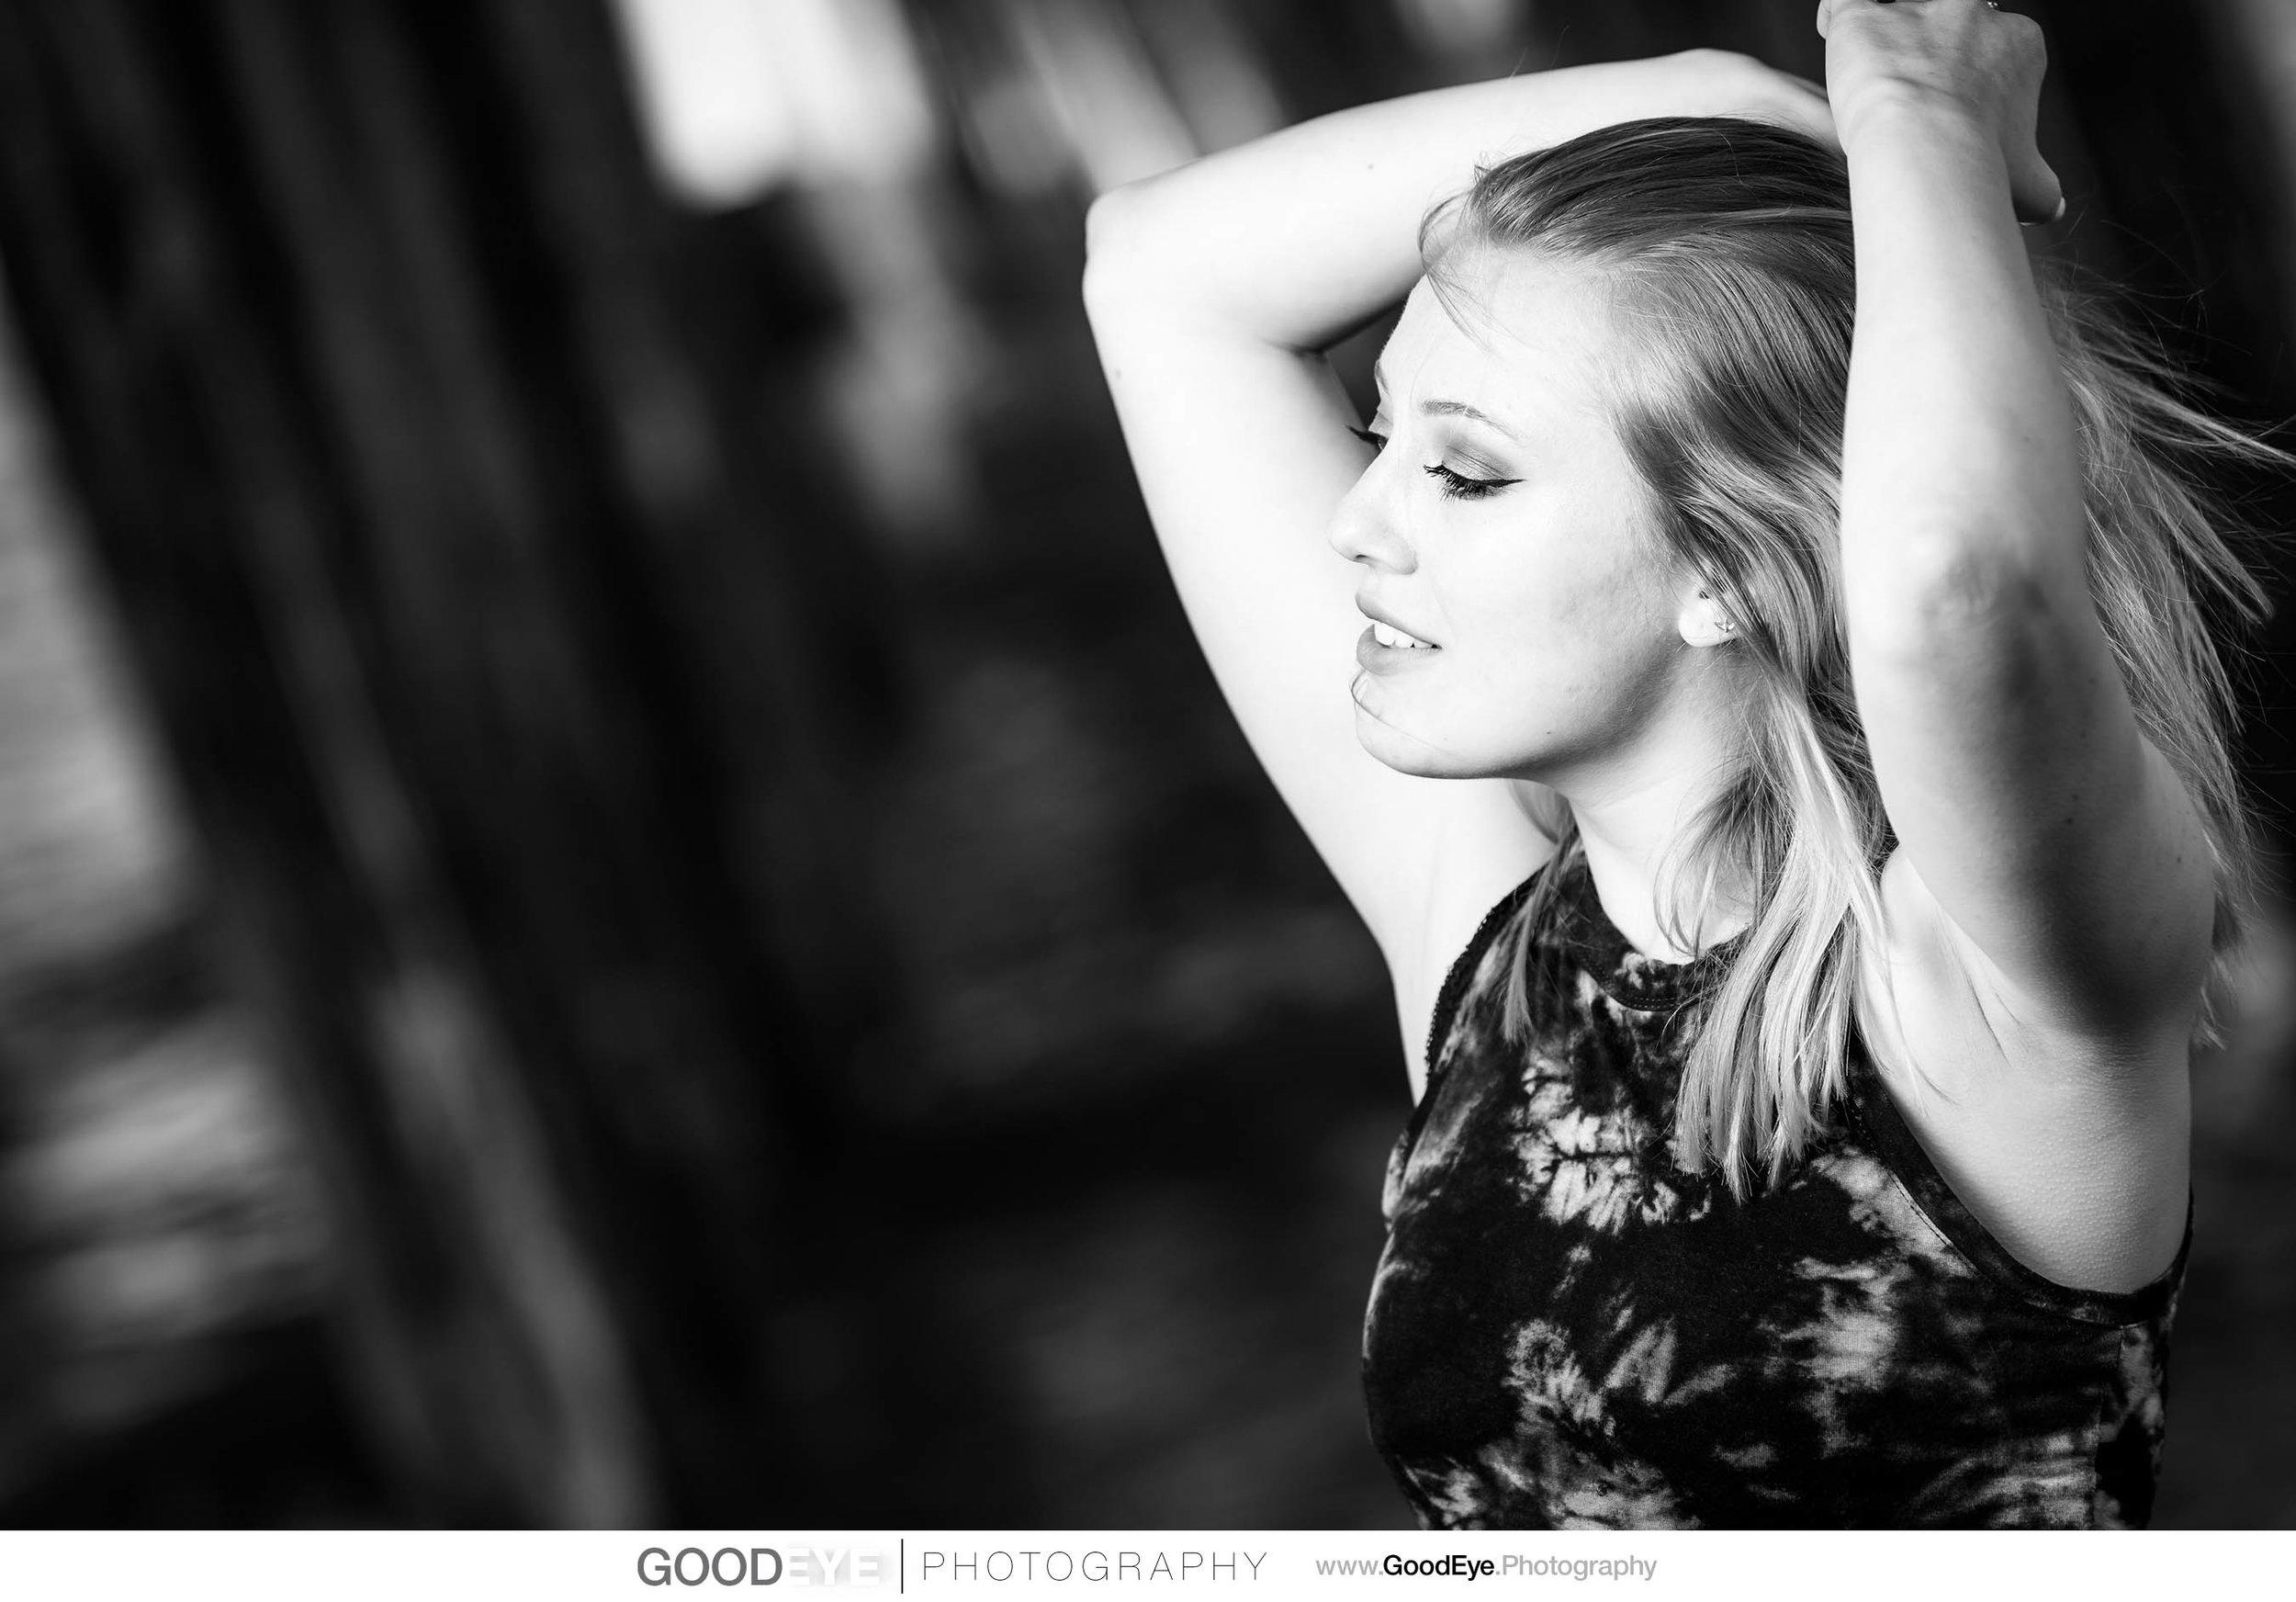 Capitola Beach Senior Portrait Photography - by Bay Area Portrai